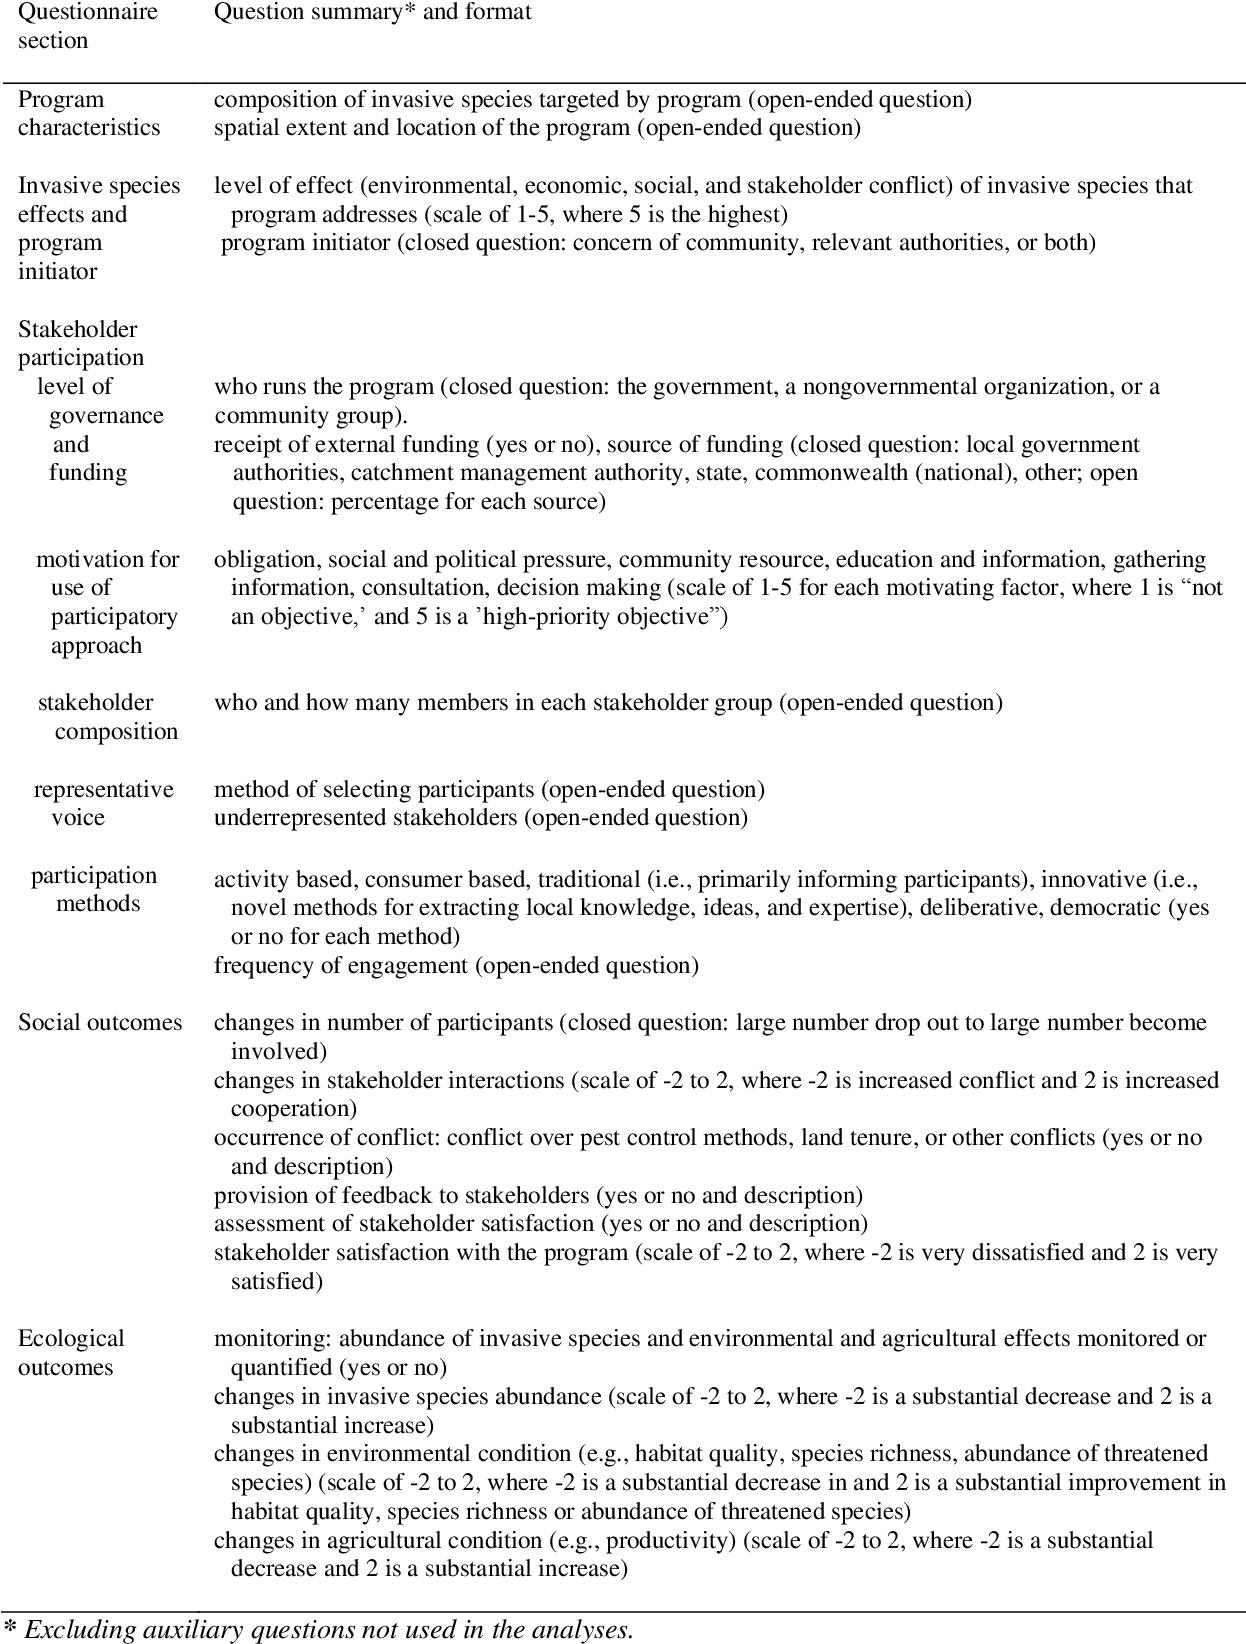 PDF] Conservation, society and invasive species - Semantic